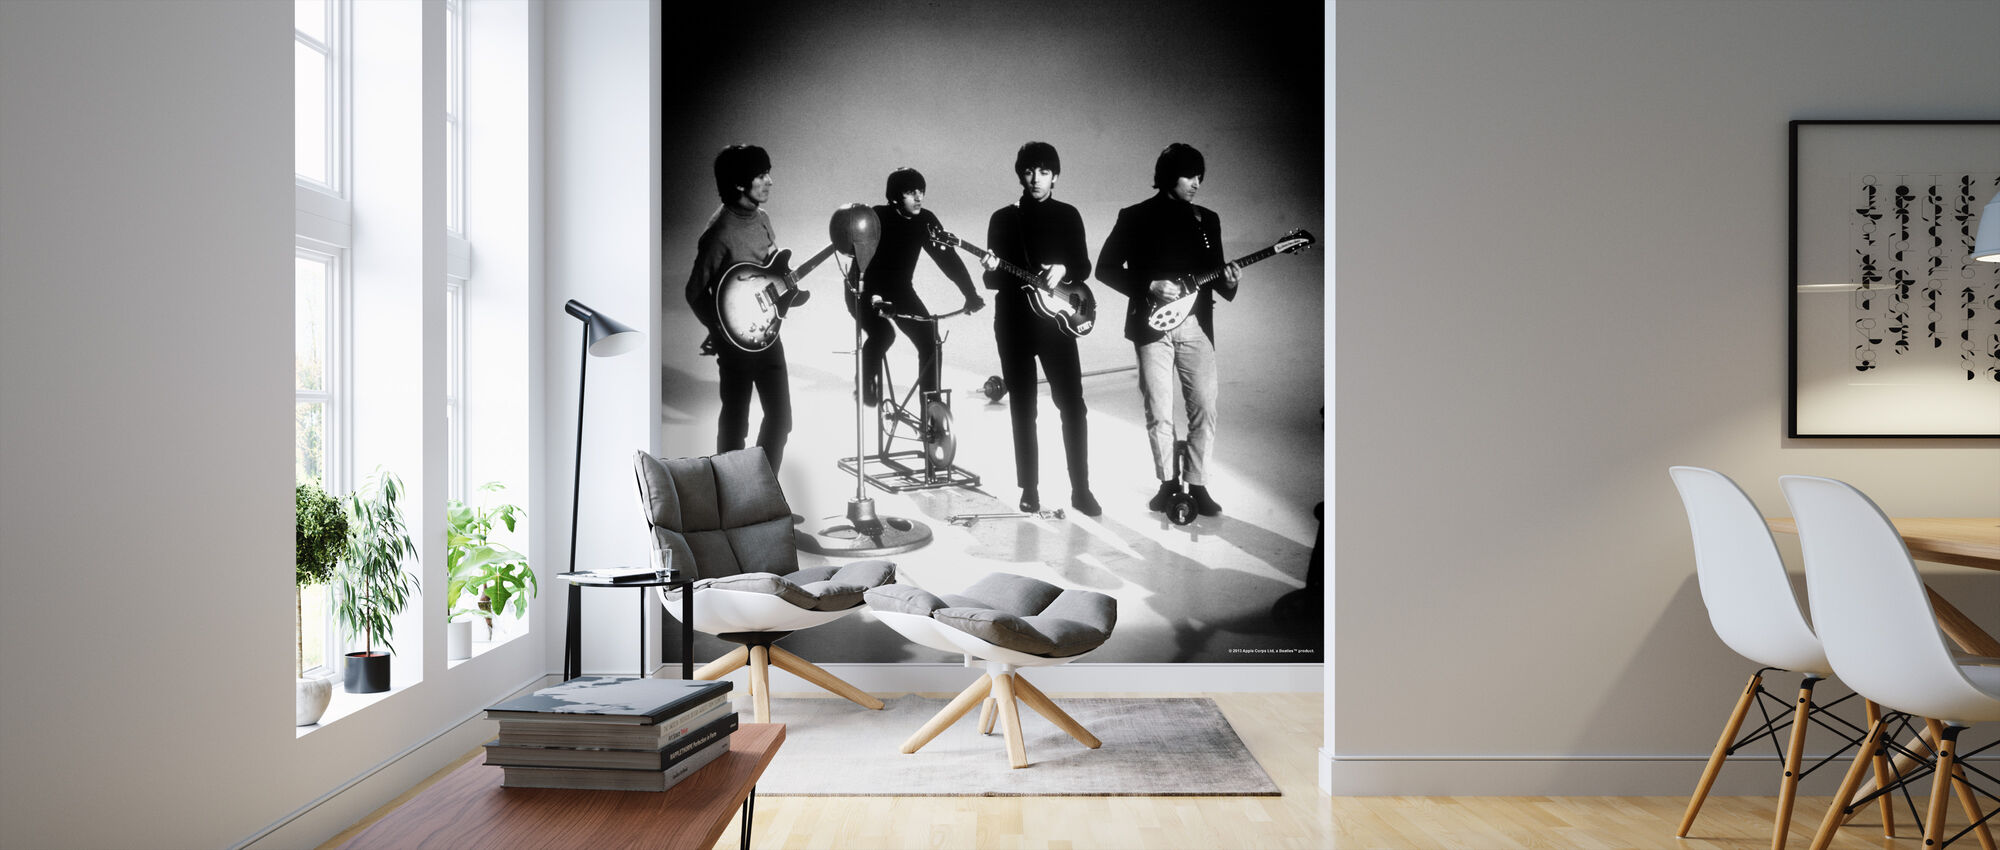 Beatles - Spille - Tapet - Stue